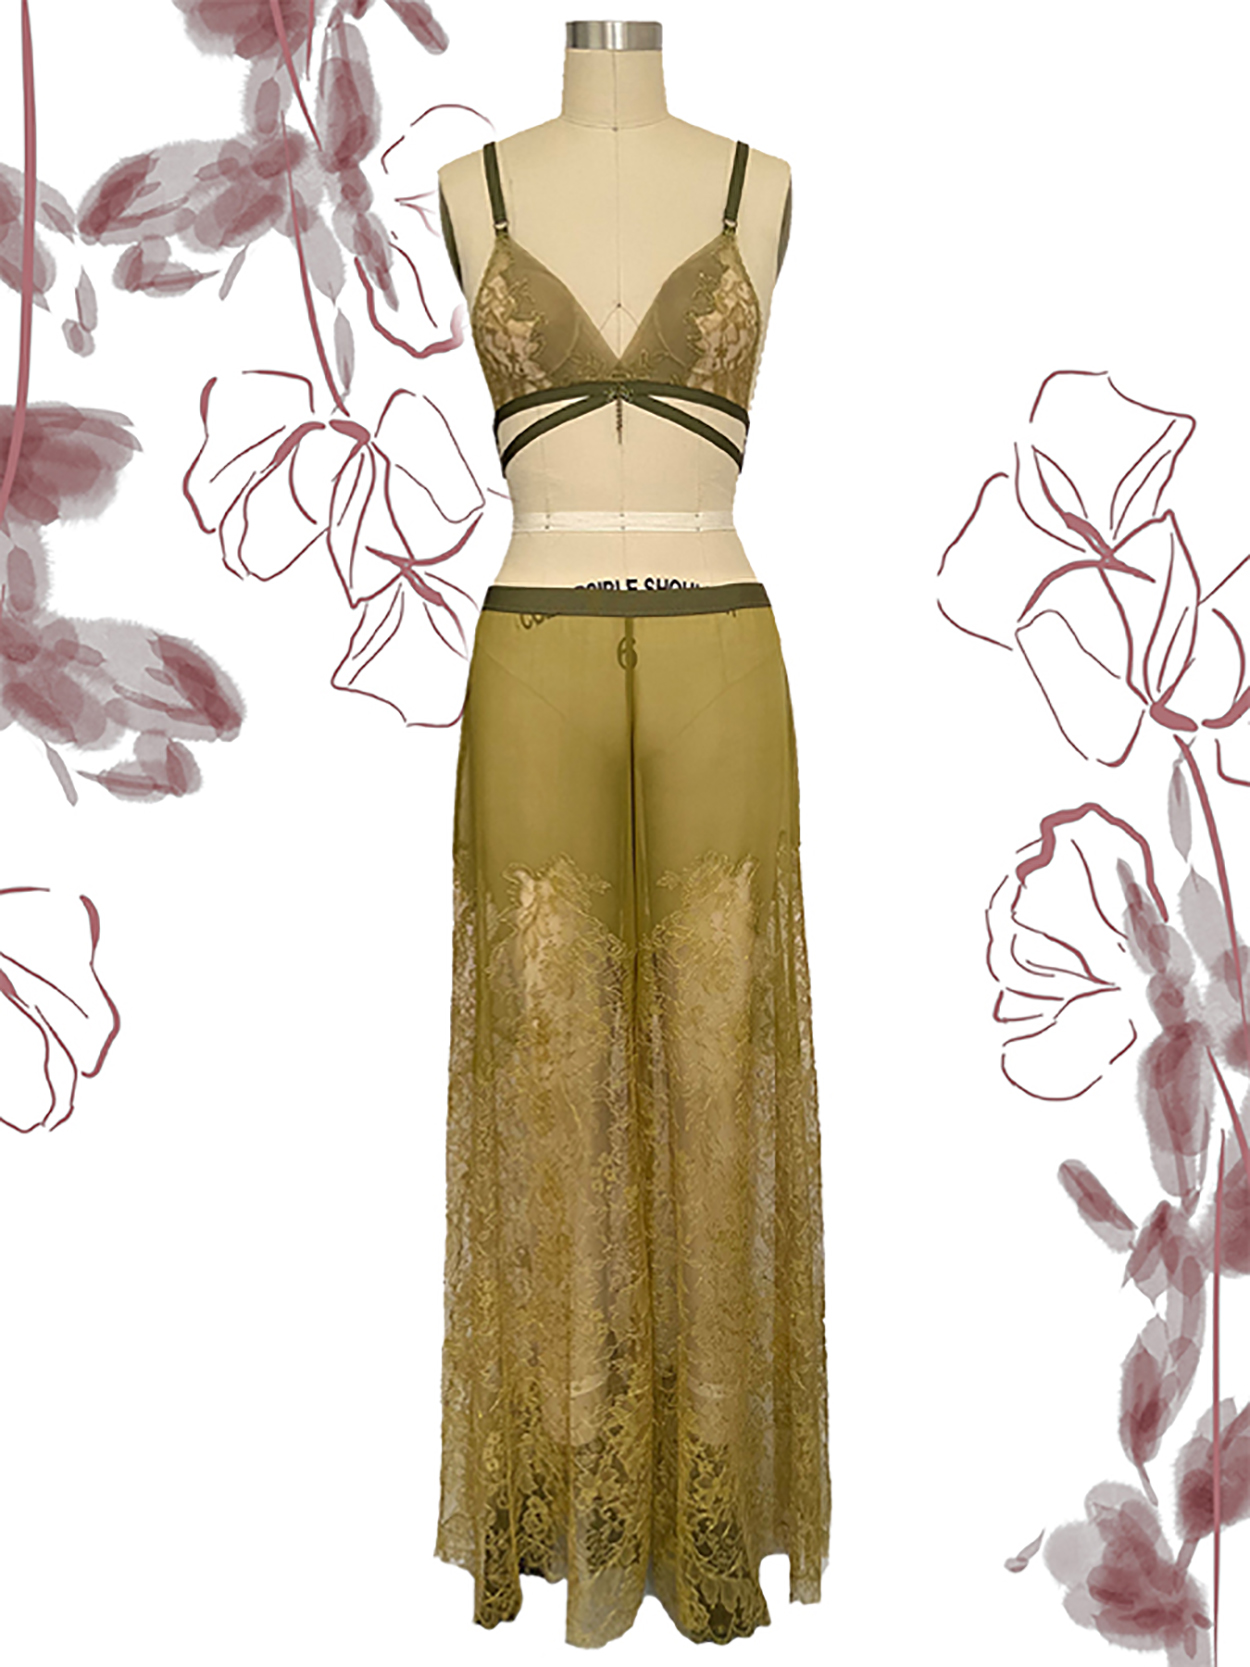 Chartreuse Sheer Illusion Soft Bra & Long Silk Chiffon Pant w/Applique Lace